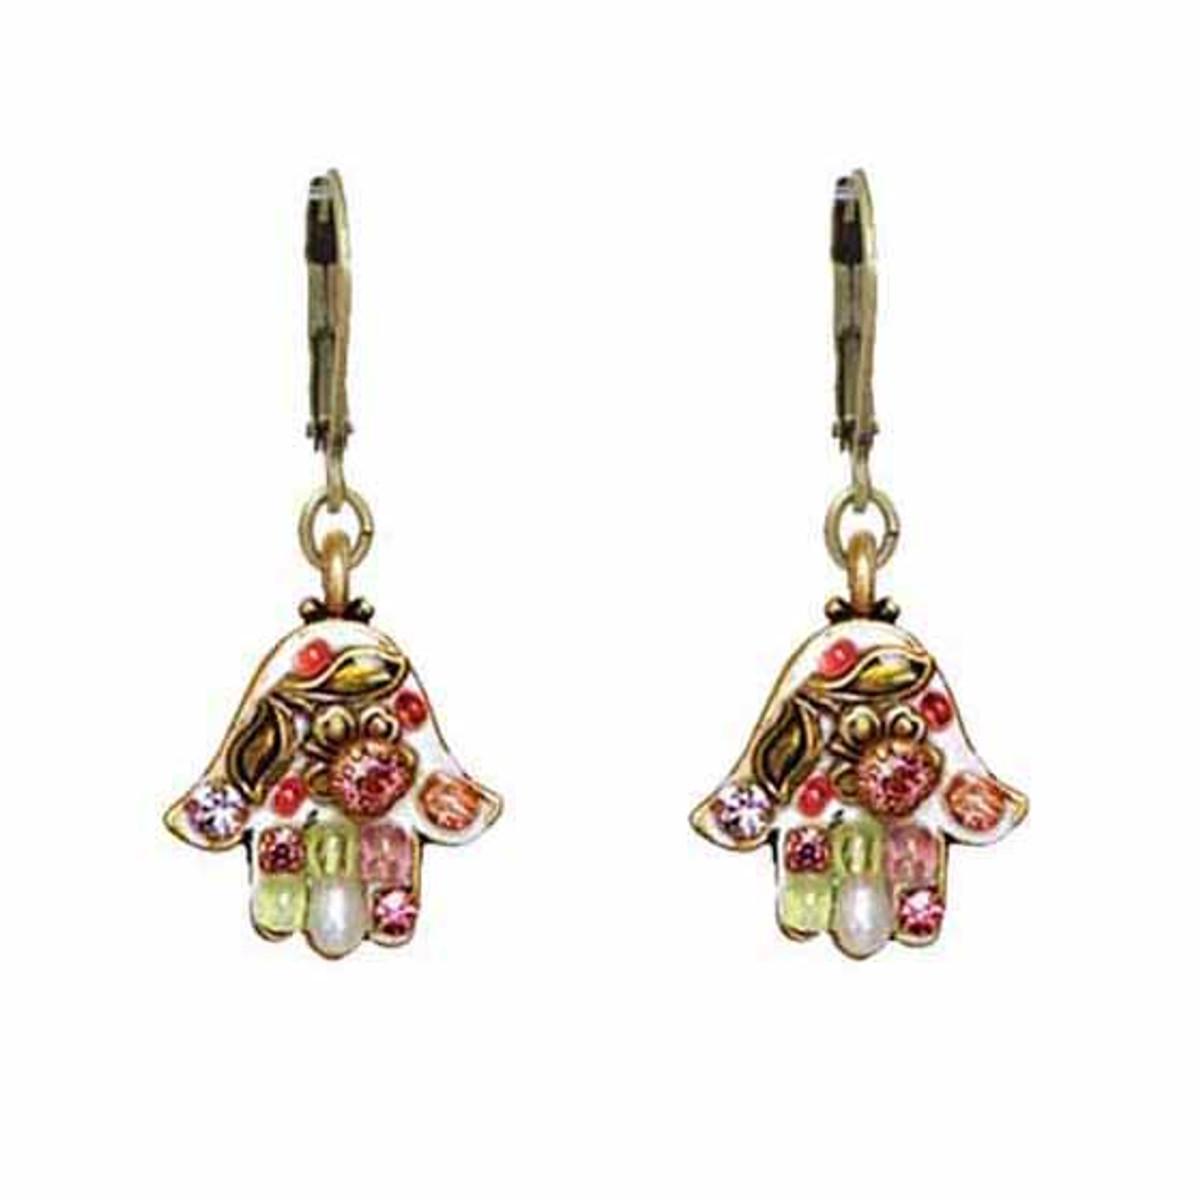 Michal Golan Pearl Blossom Hamsa Earrings